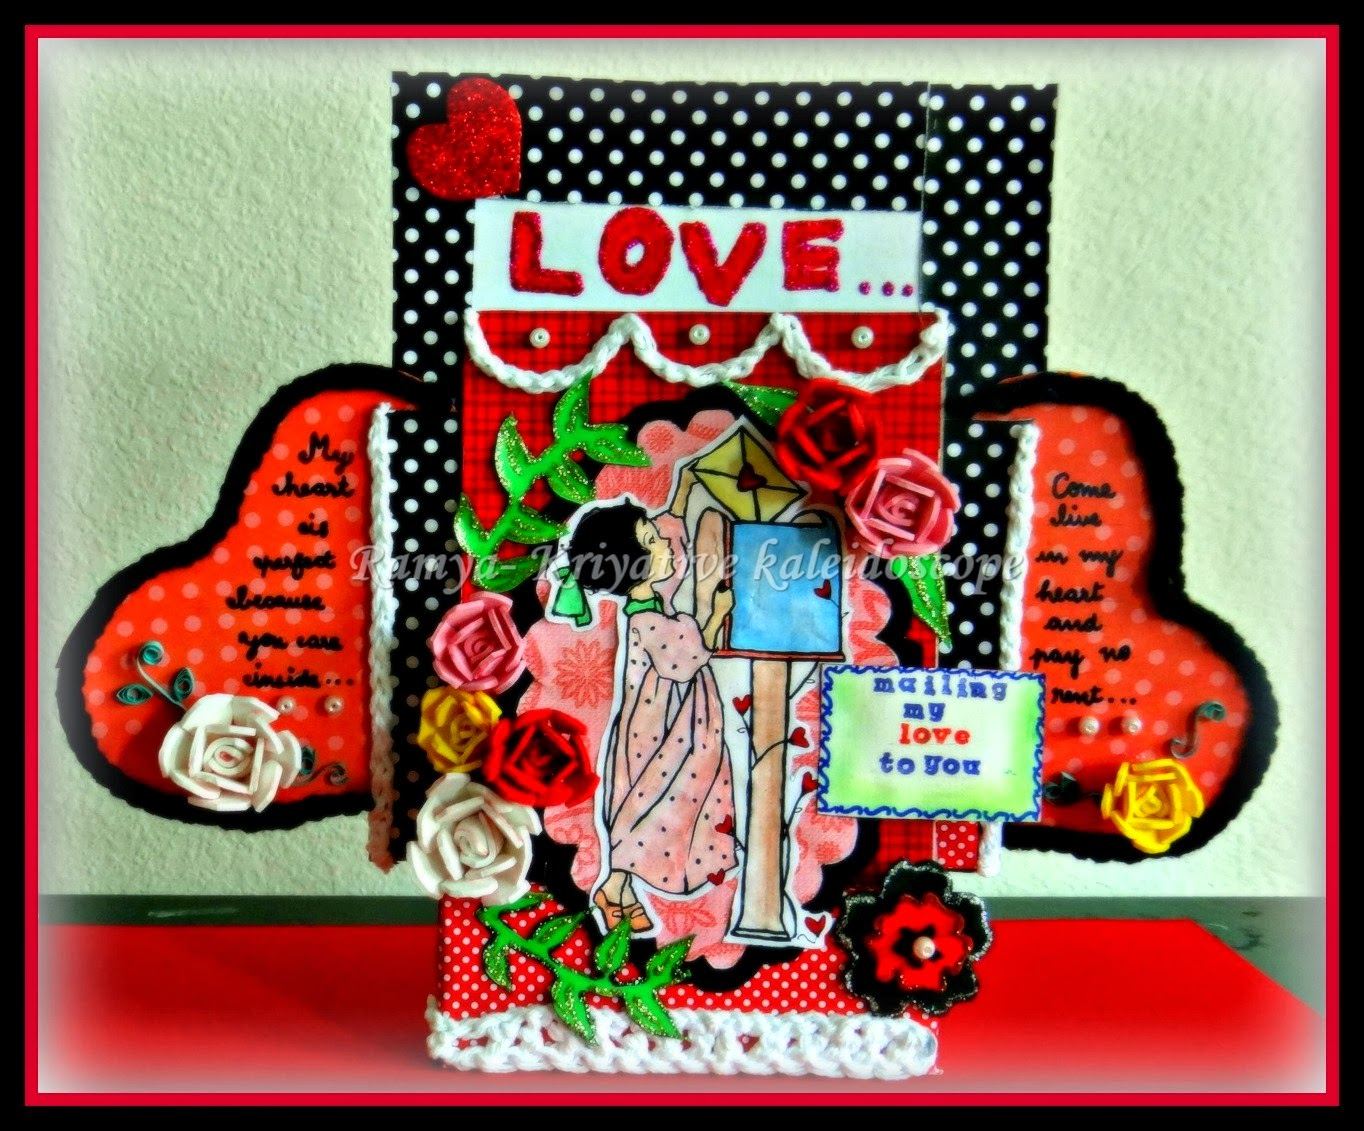 Kriya Tive Kaleidoscope Mailing My Love 3d Greeting Card